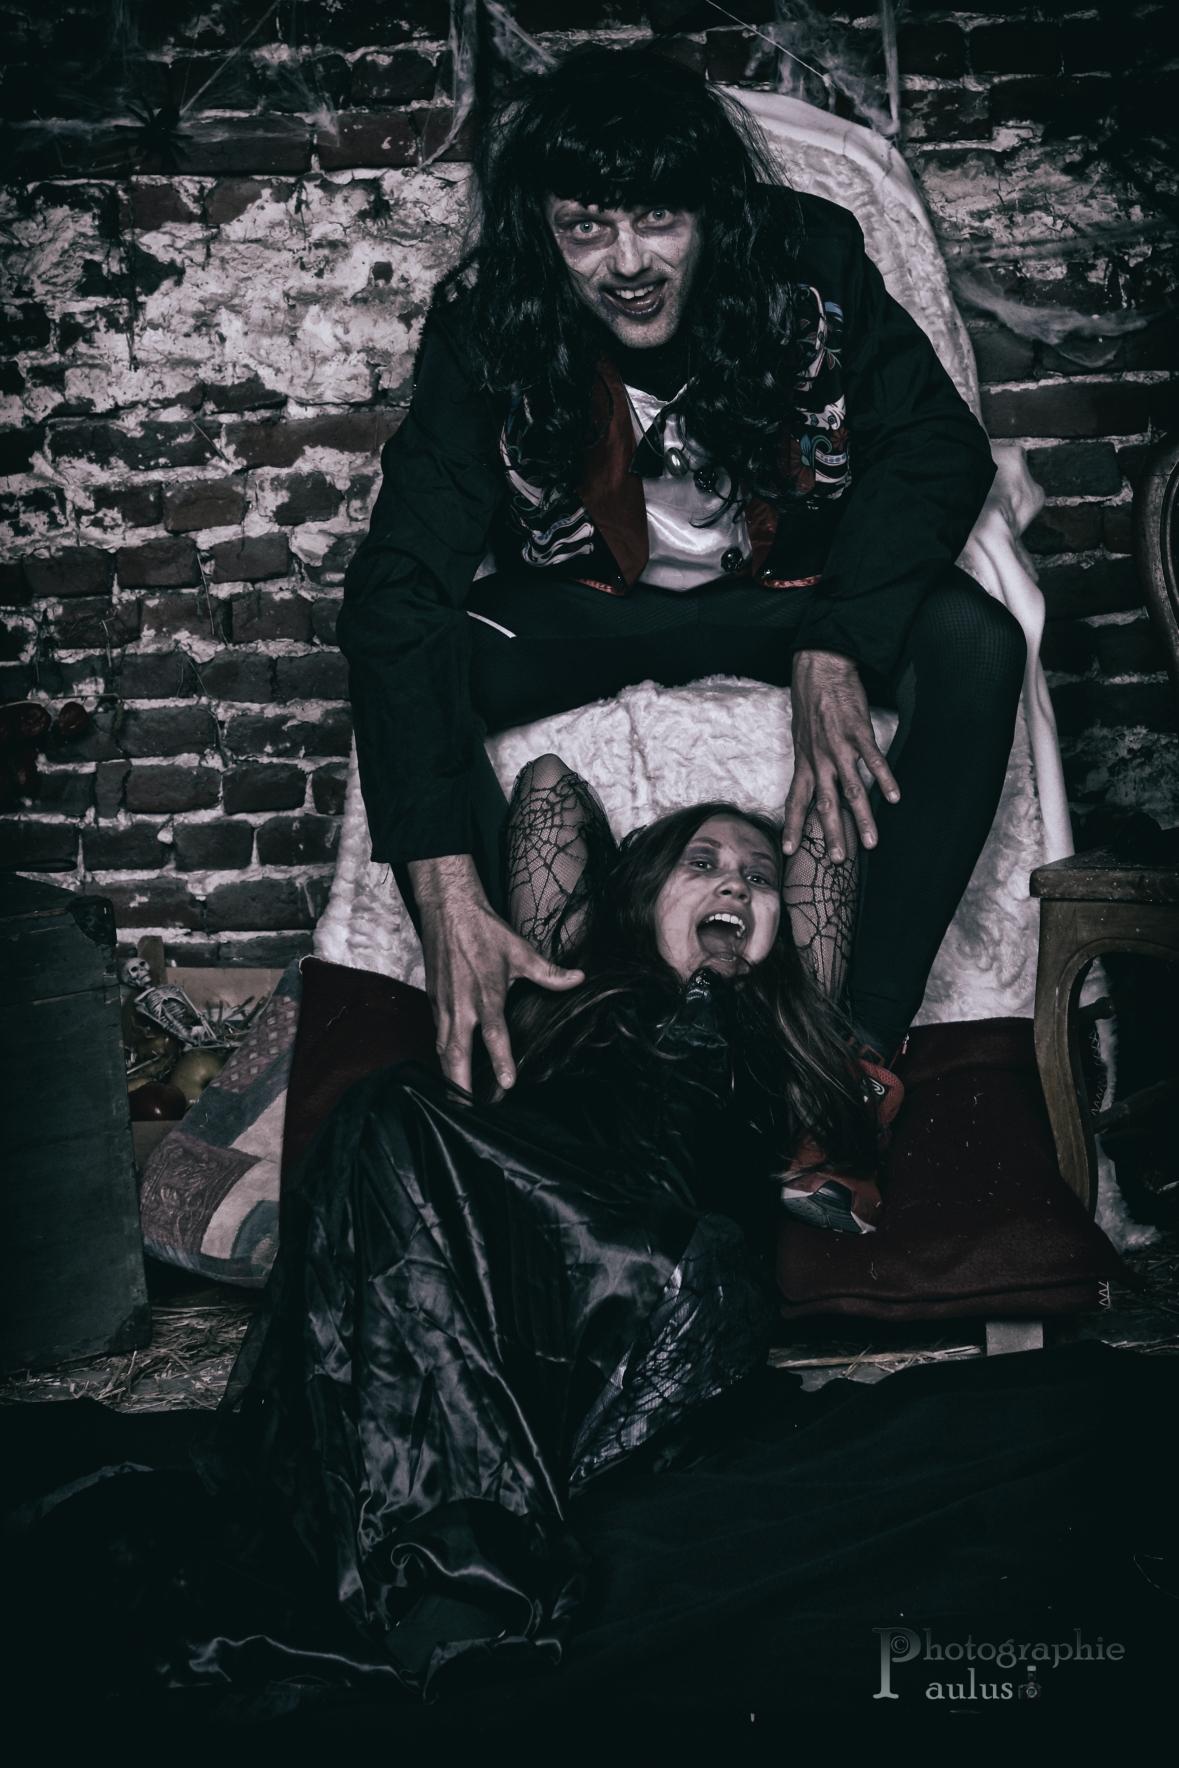 Halloween2019.0091